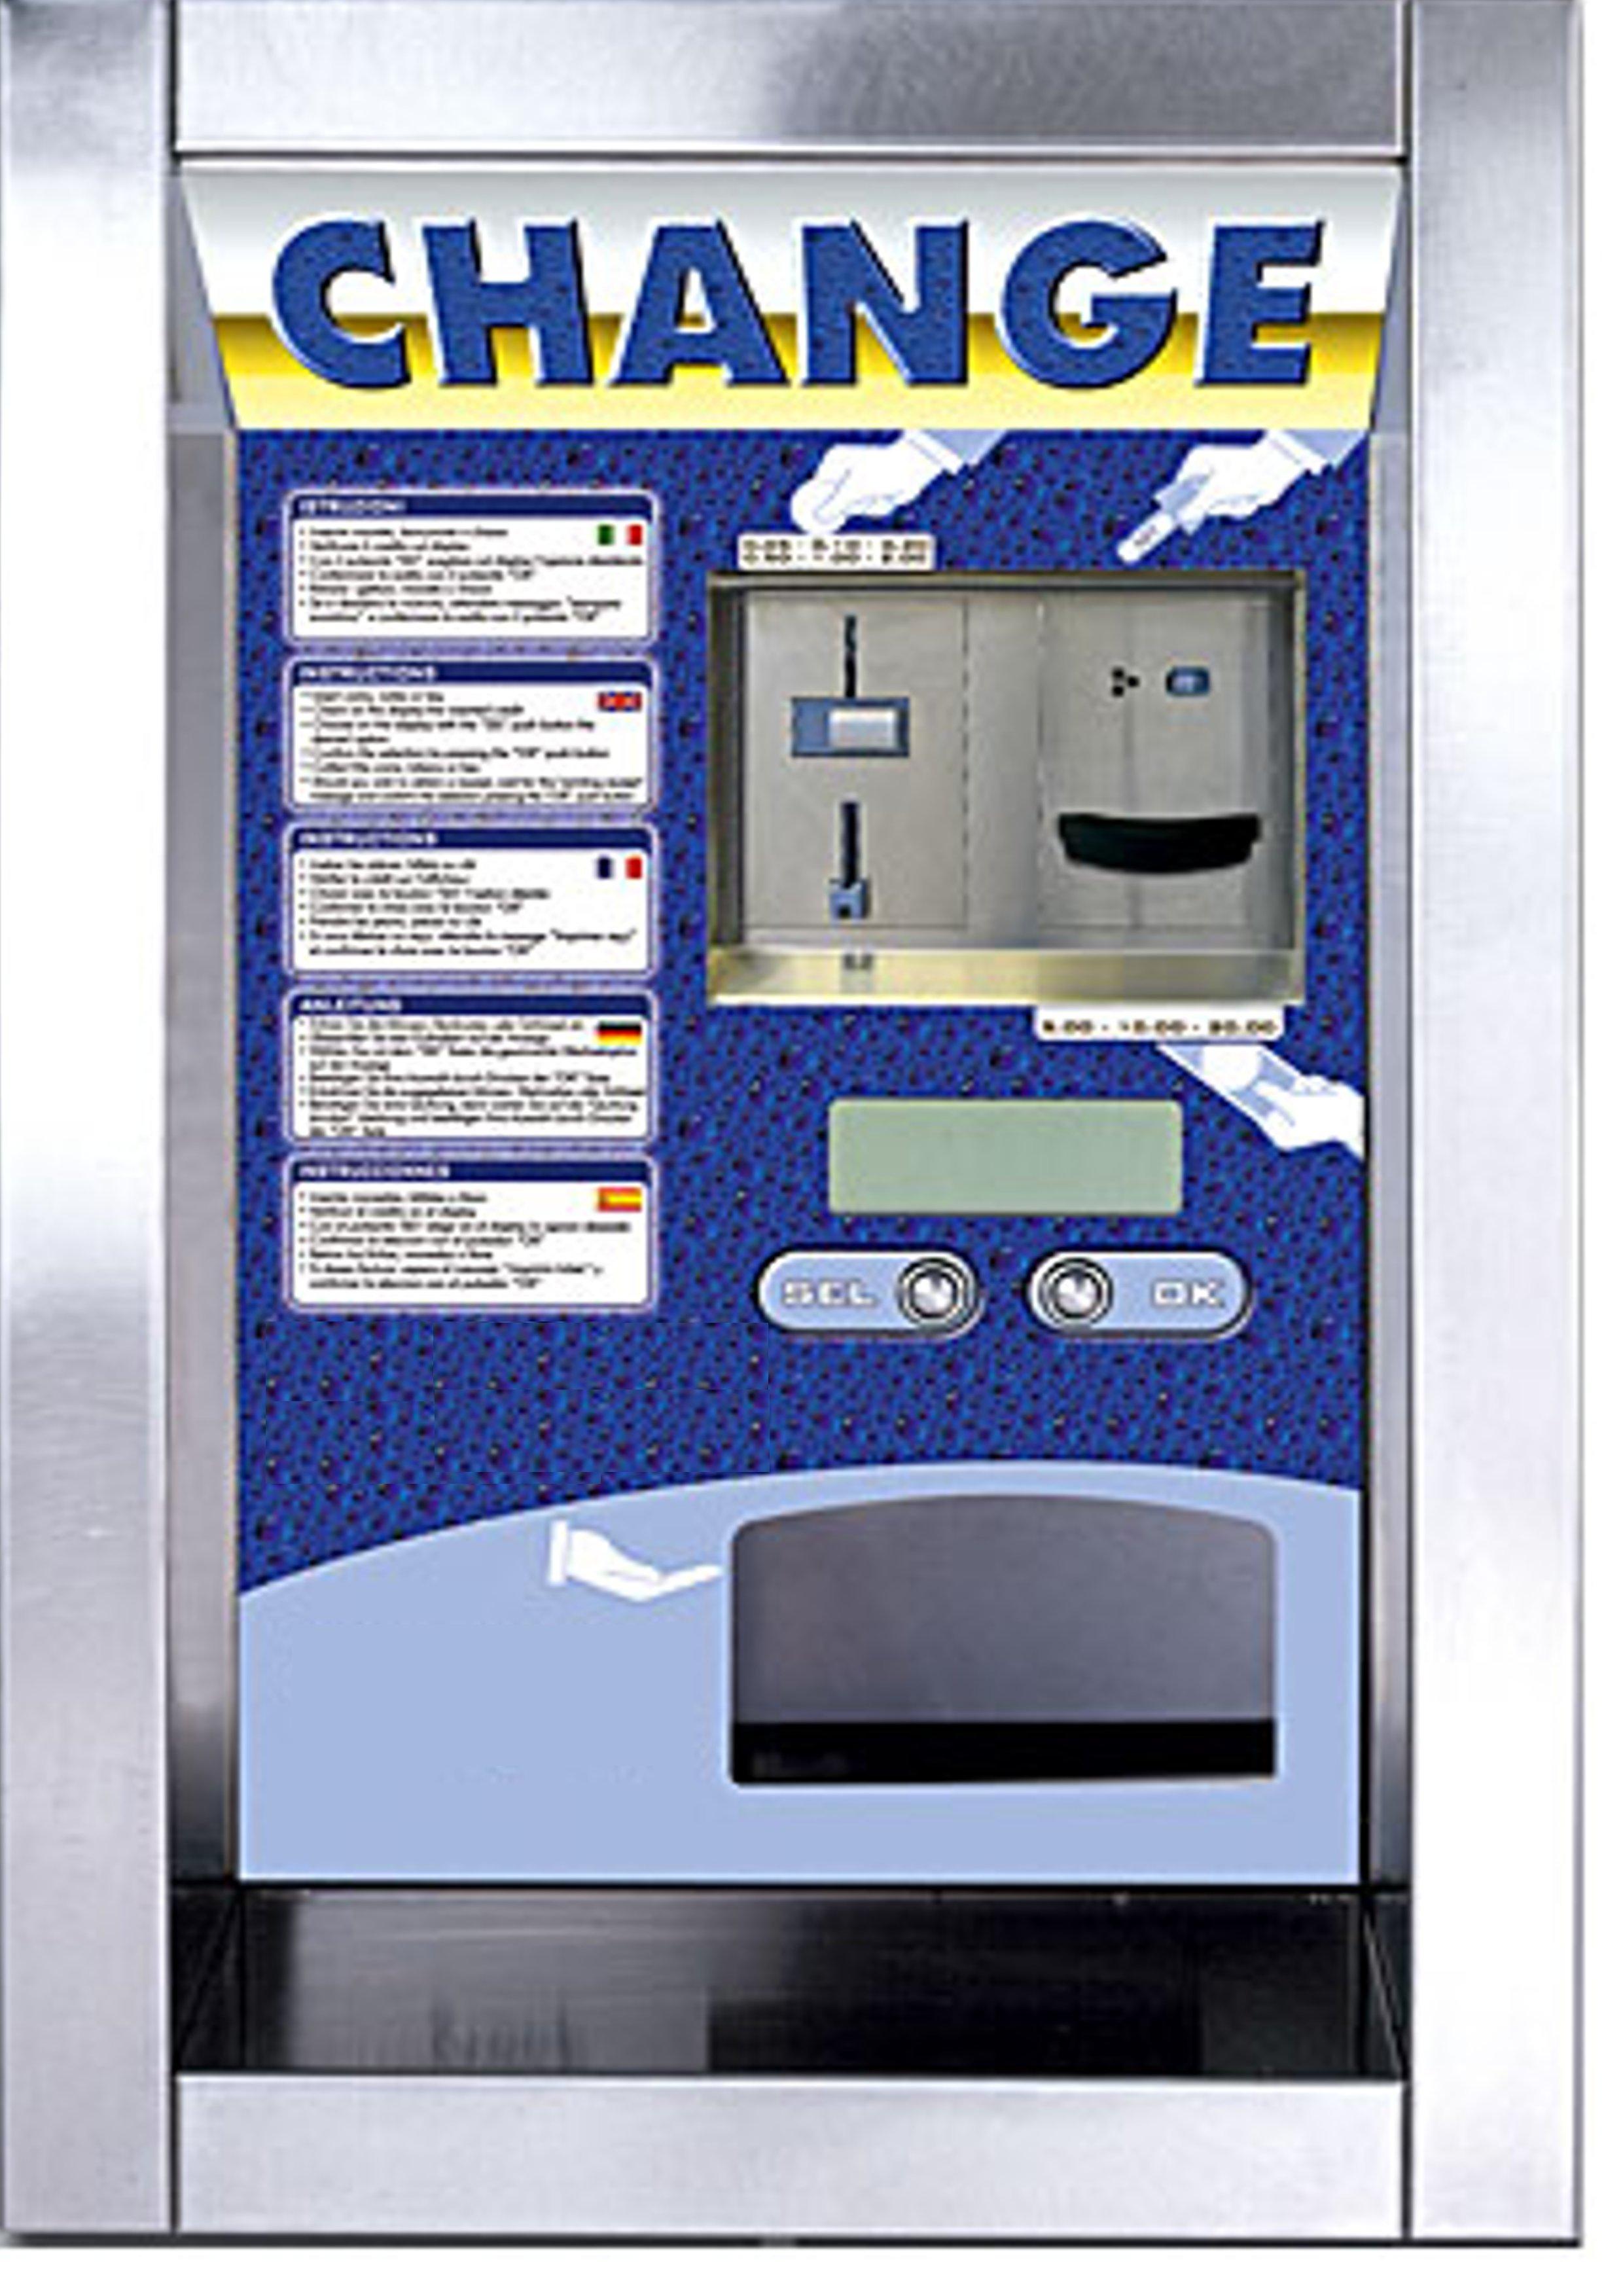 Maquina cambio corregida 1-1.jpg